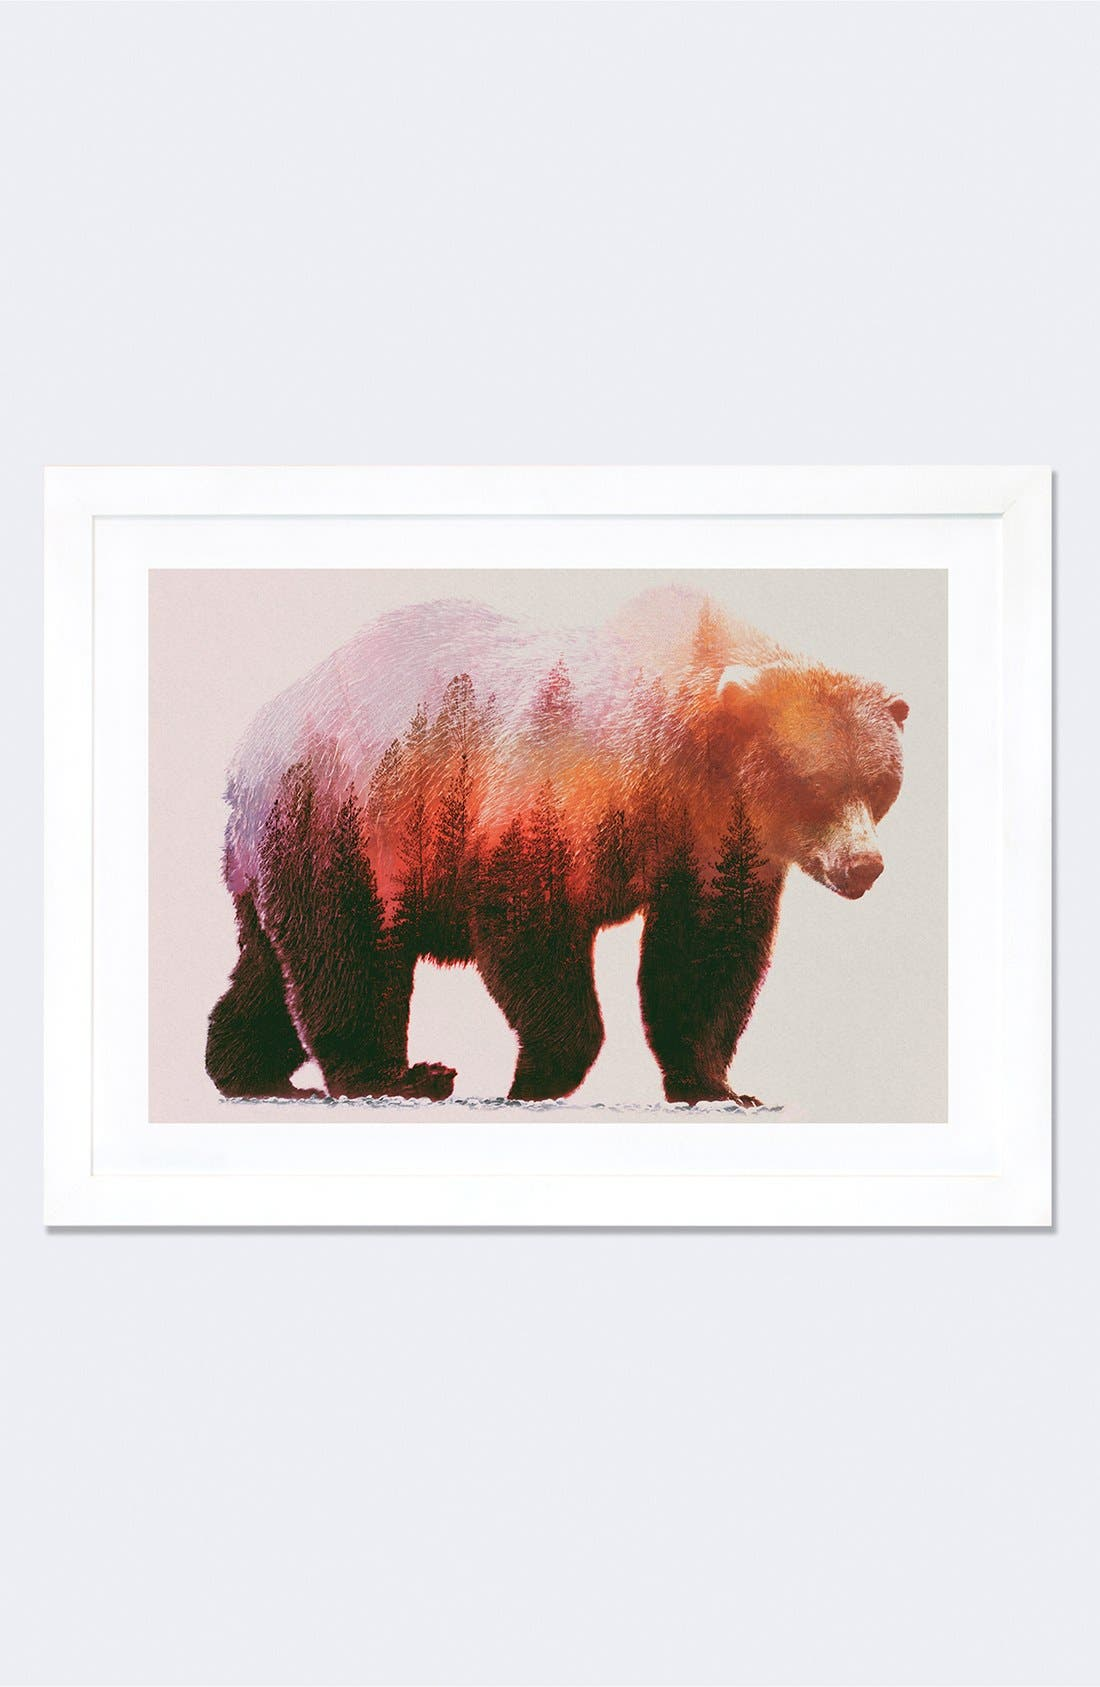 Alternate Image 1 Selected - iCanvas 'Brown Bear' Giclée Print Framed Canvas Art